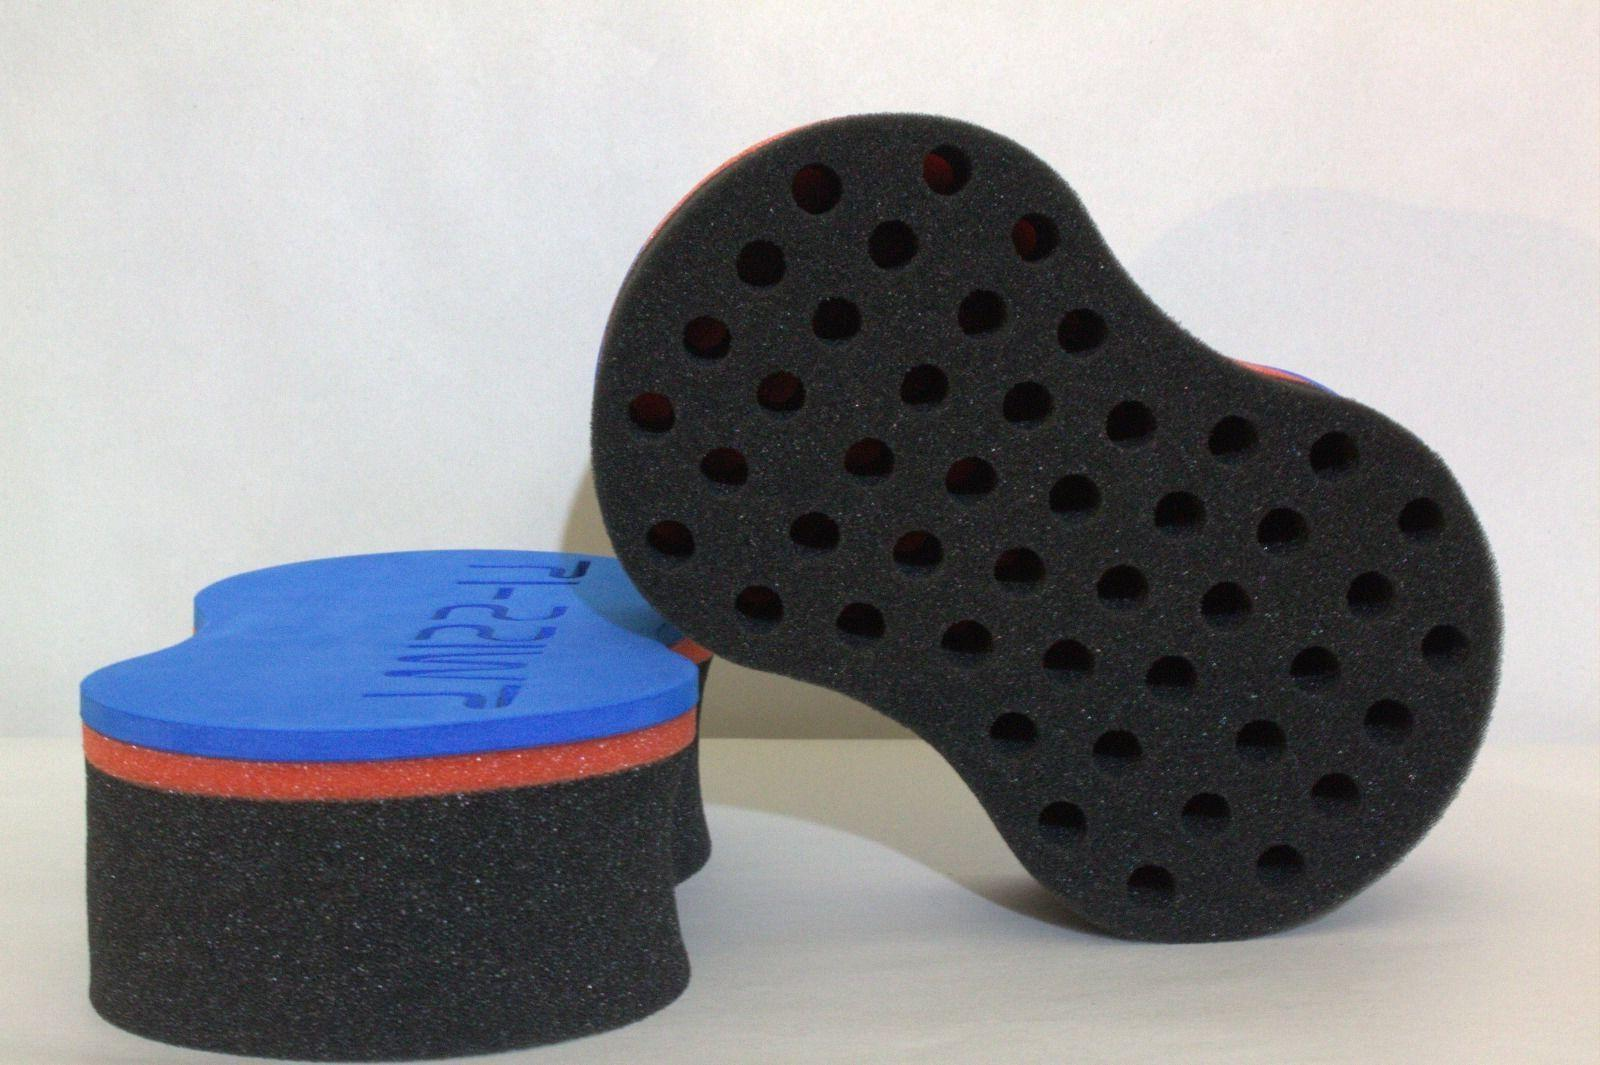 Spin Sponge Brush for Locking Wave